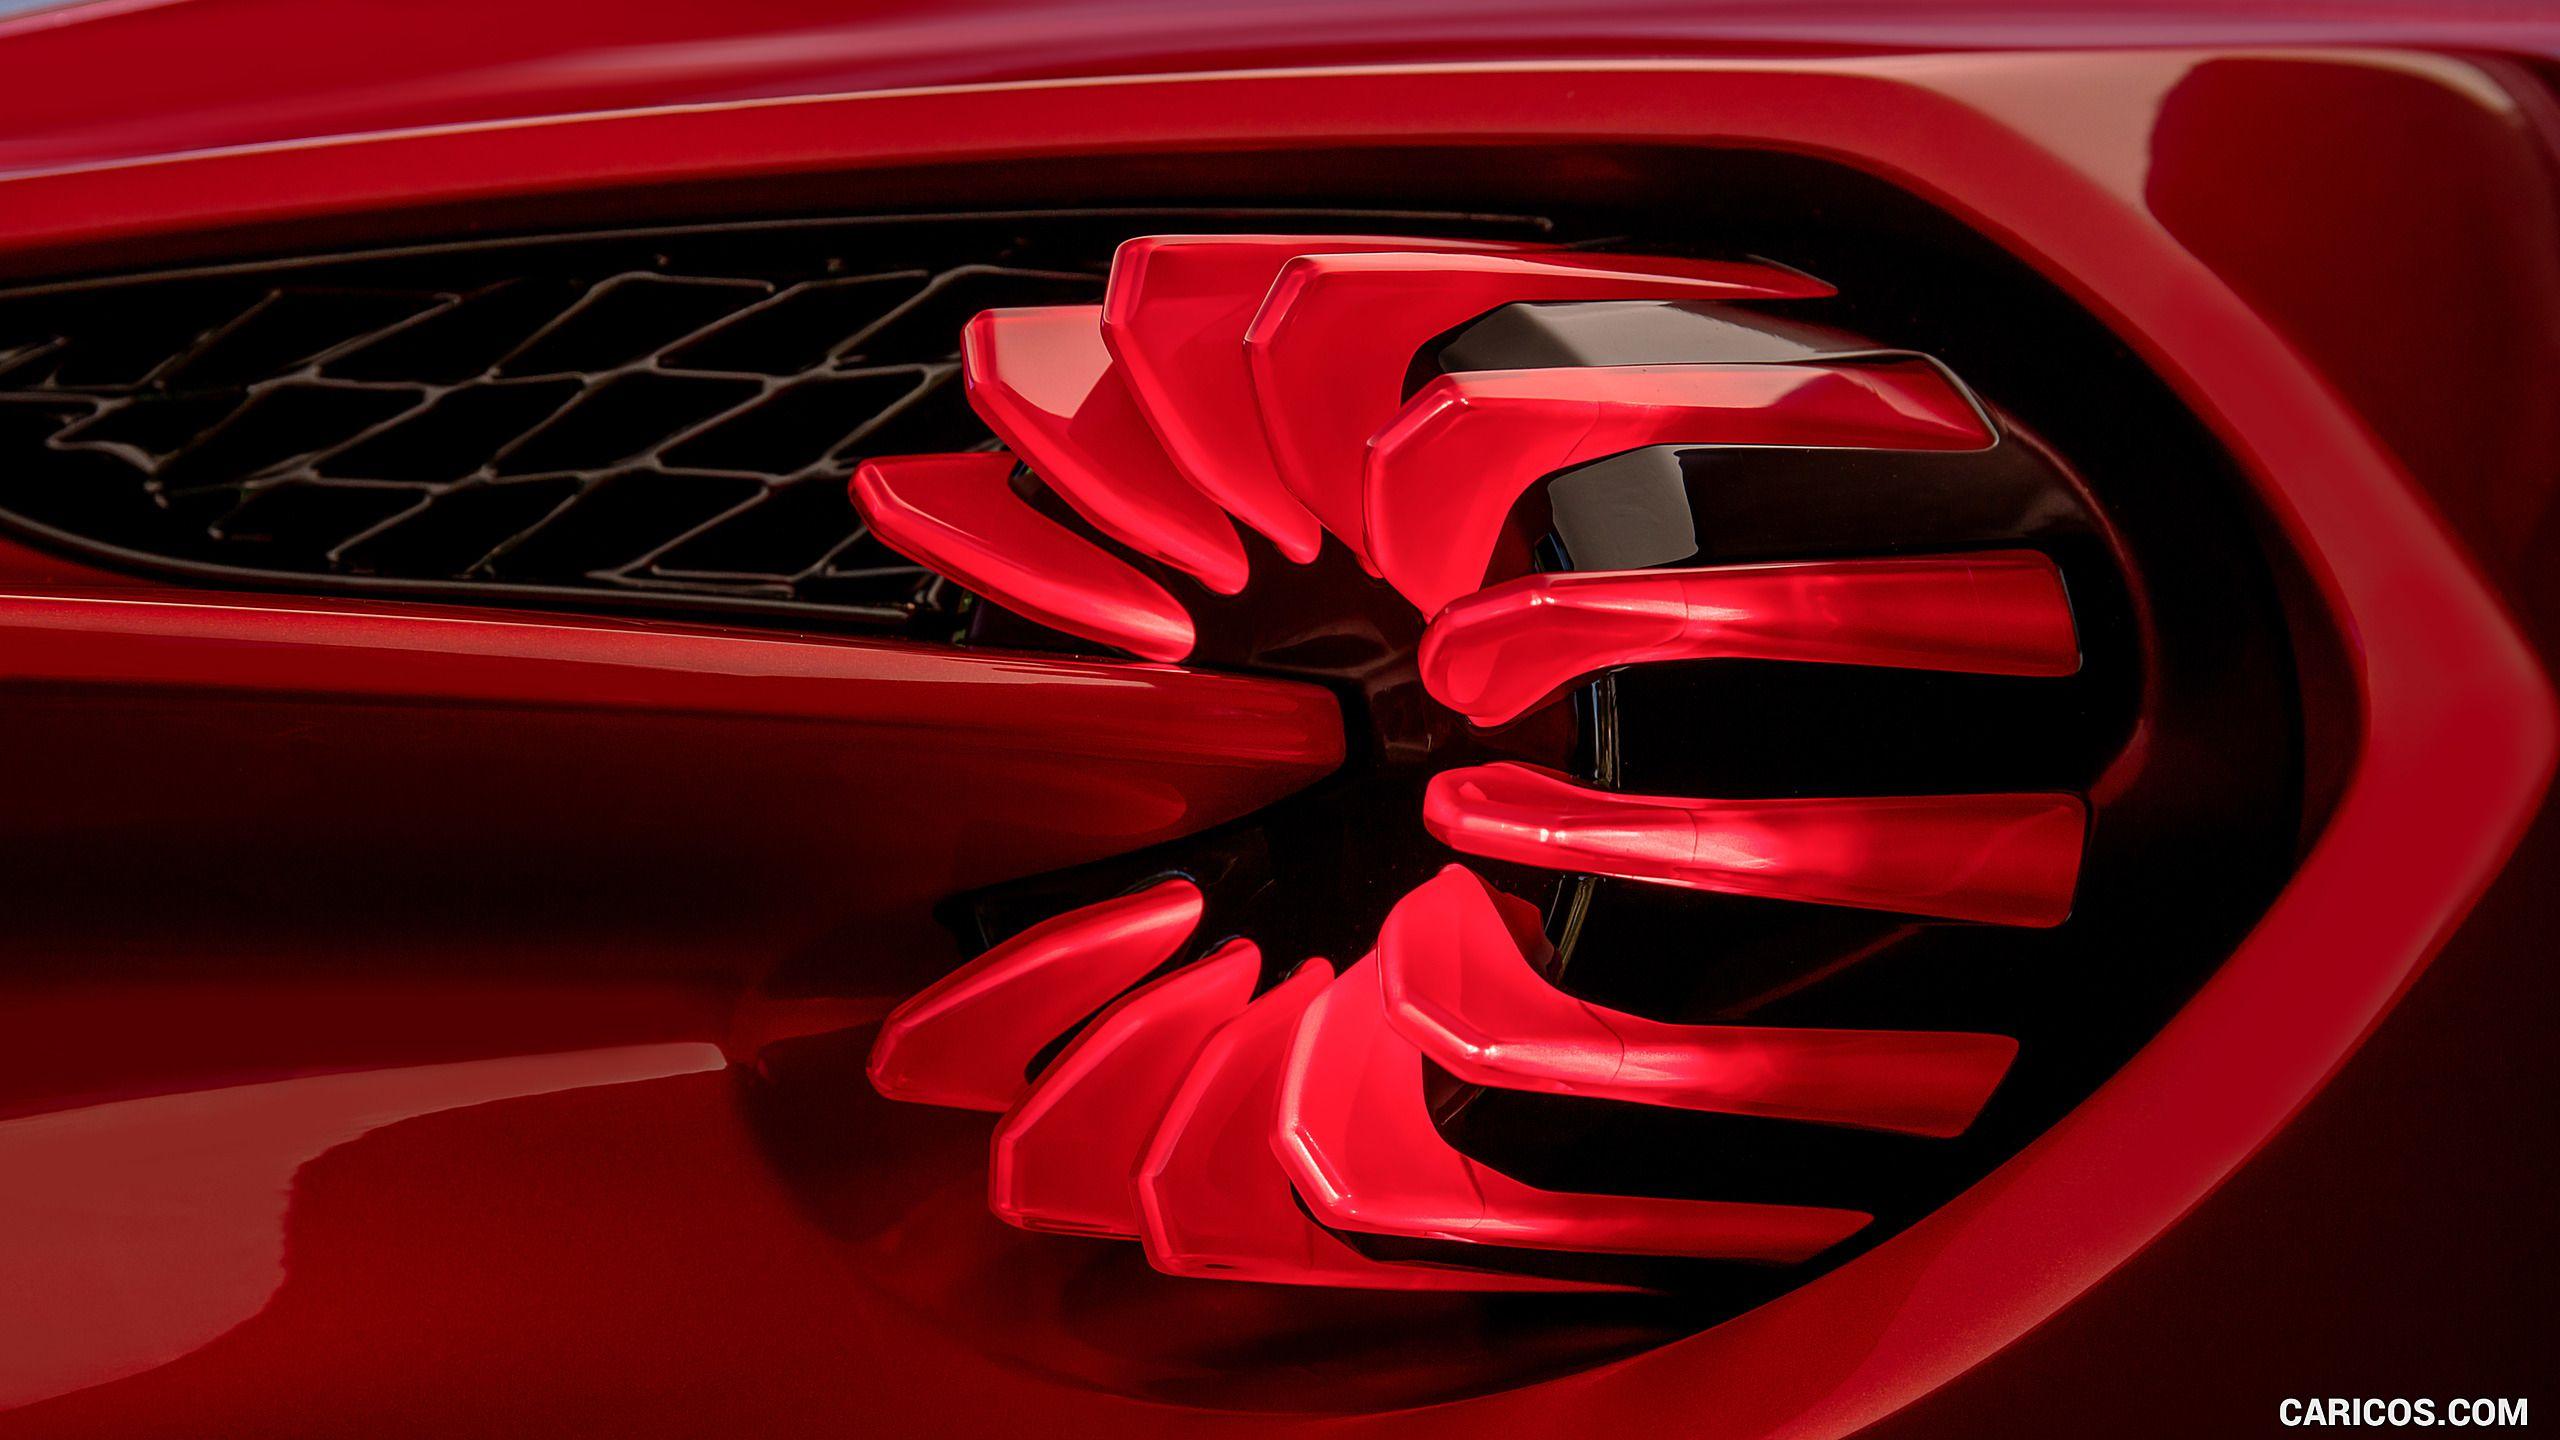 2016 Aston Martin Vanquish Zagato Concept Aston Martin Vanquish Aston Martin Vulcan New Aston Martin